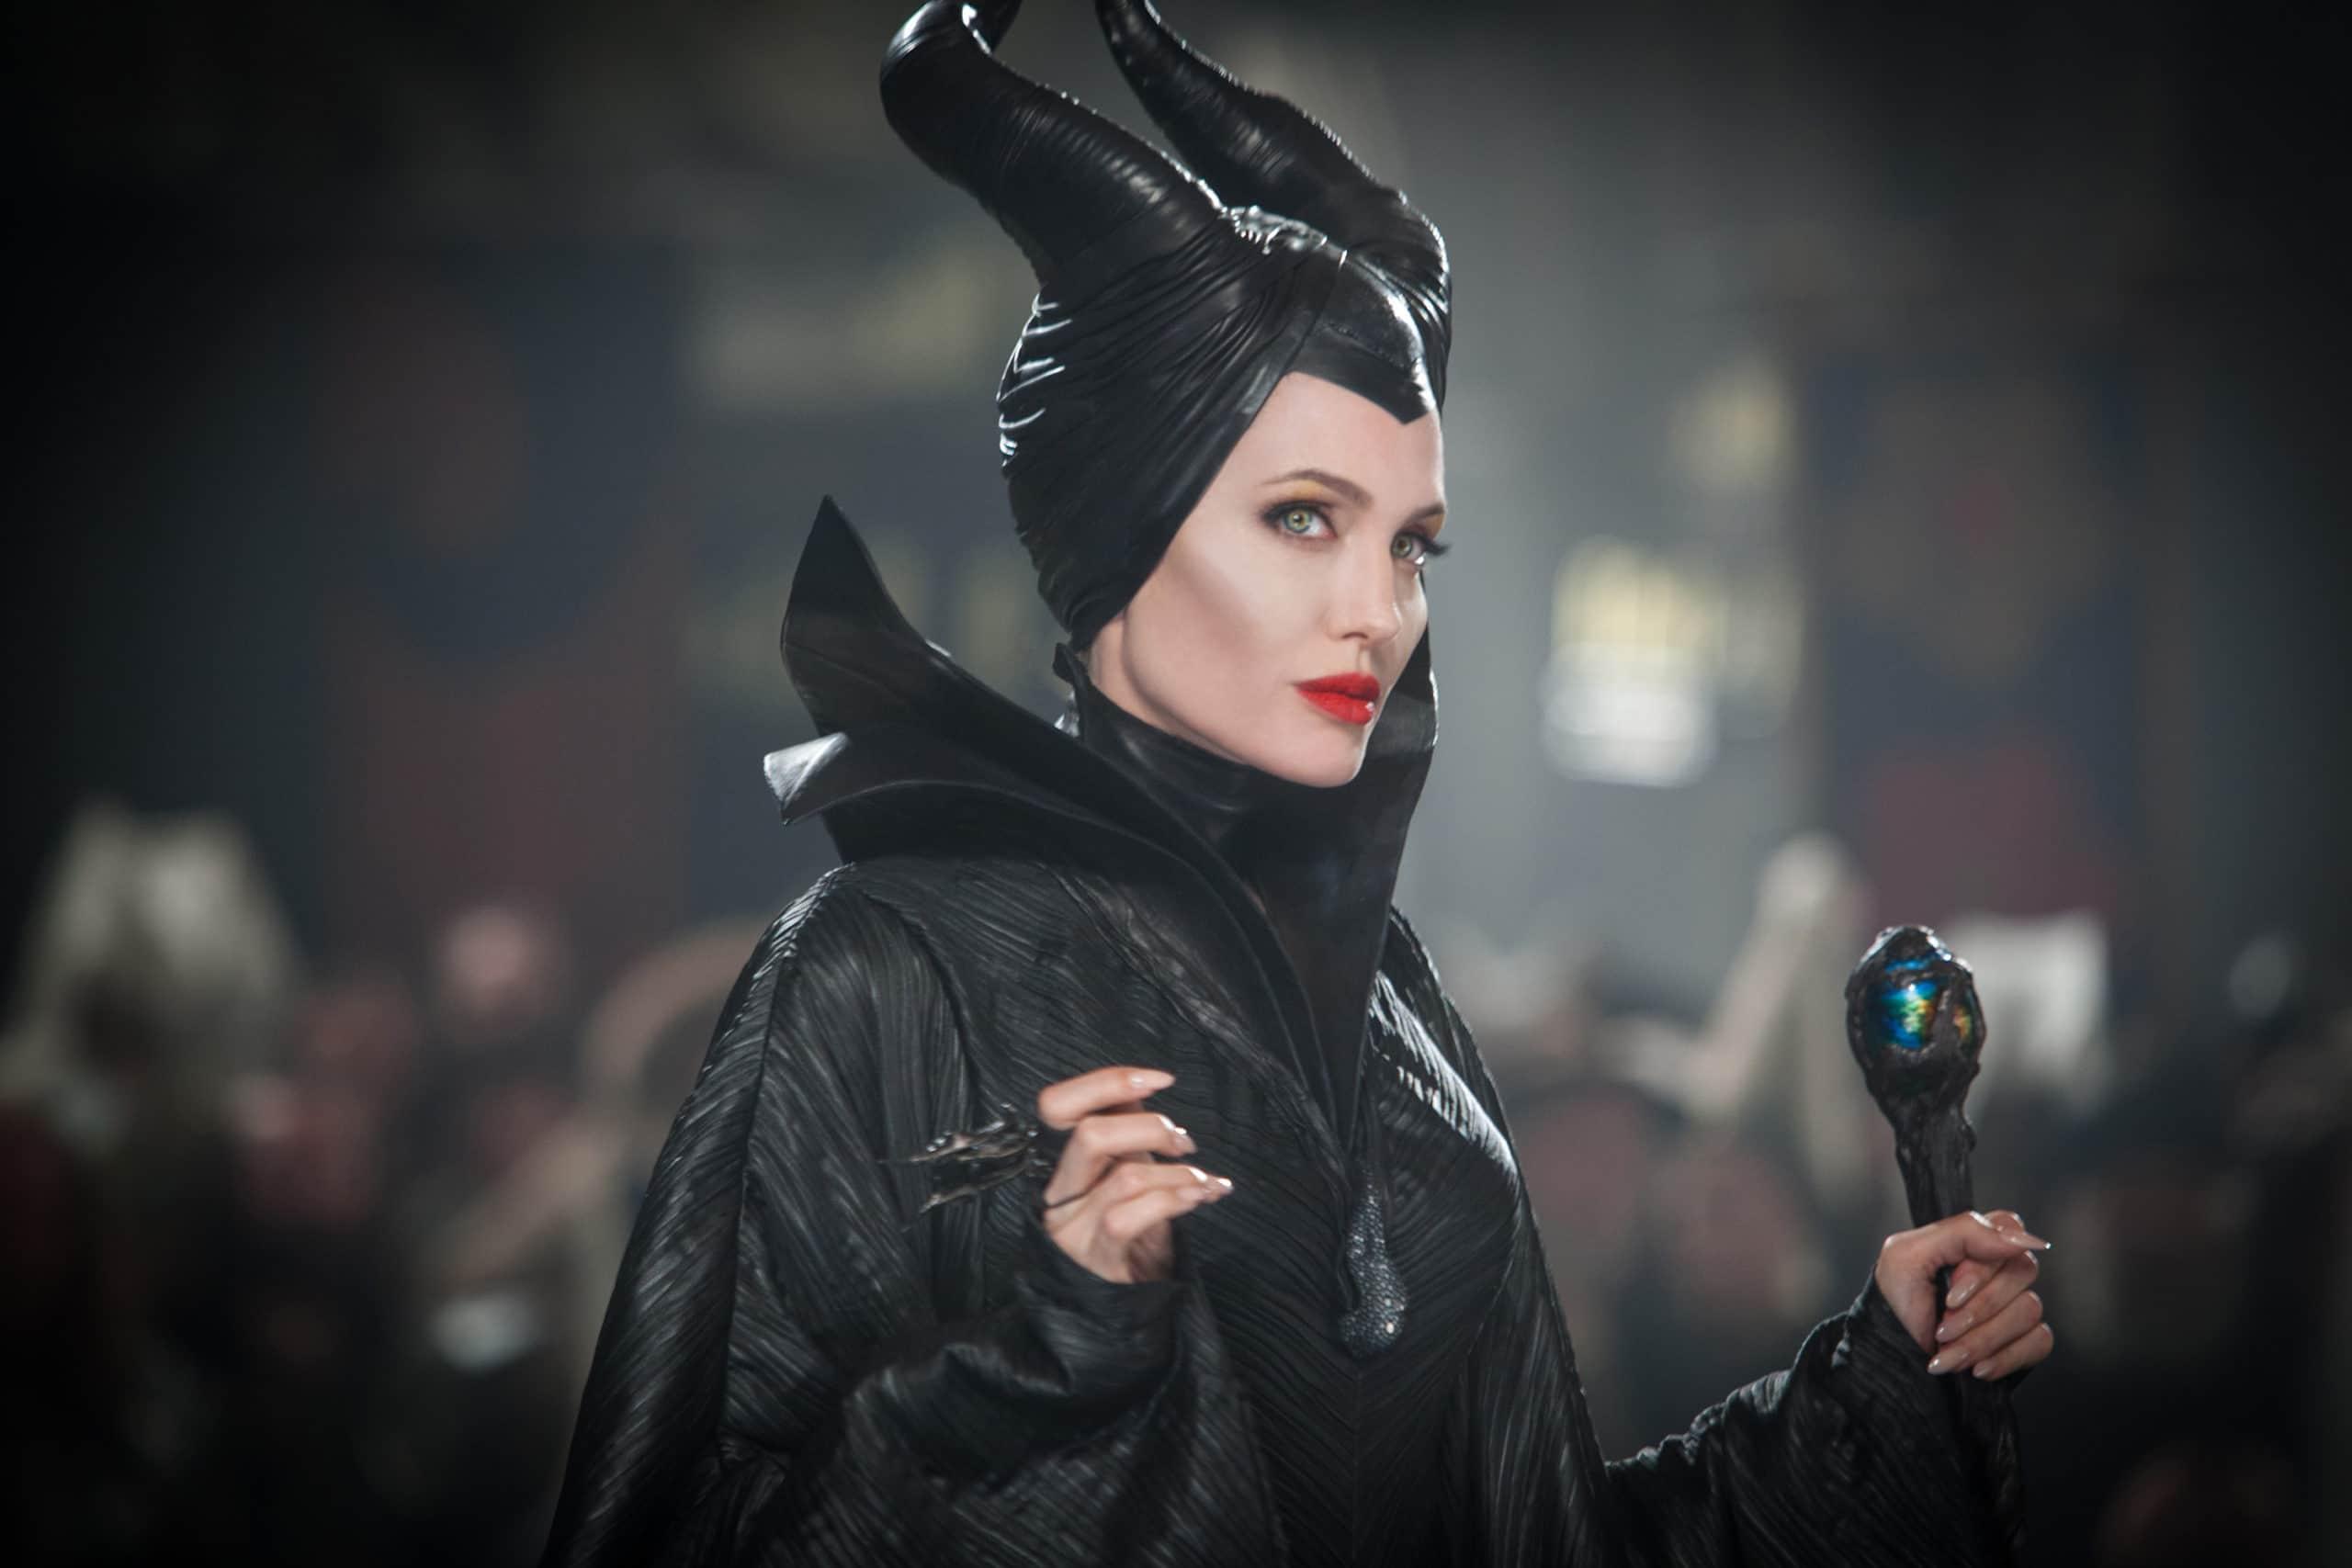 Movie villains that we secretly love 45